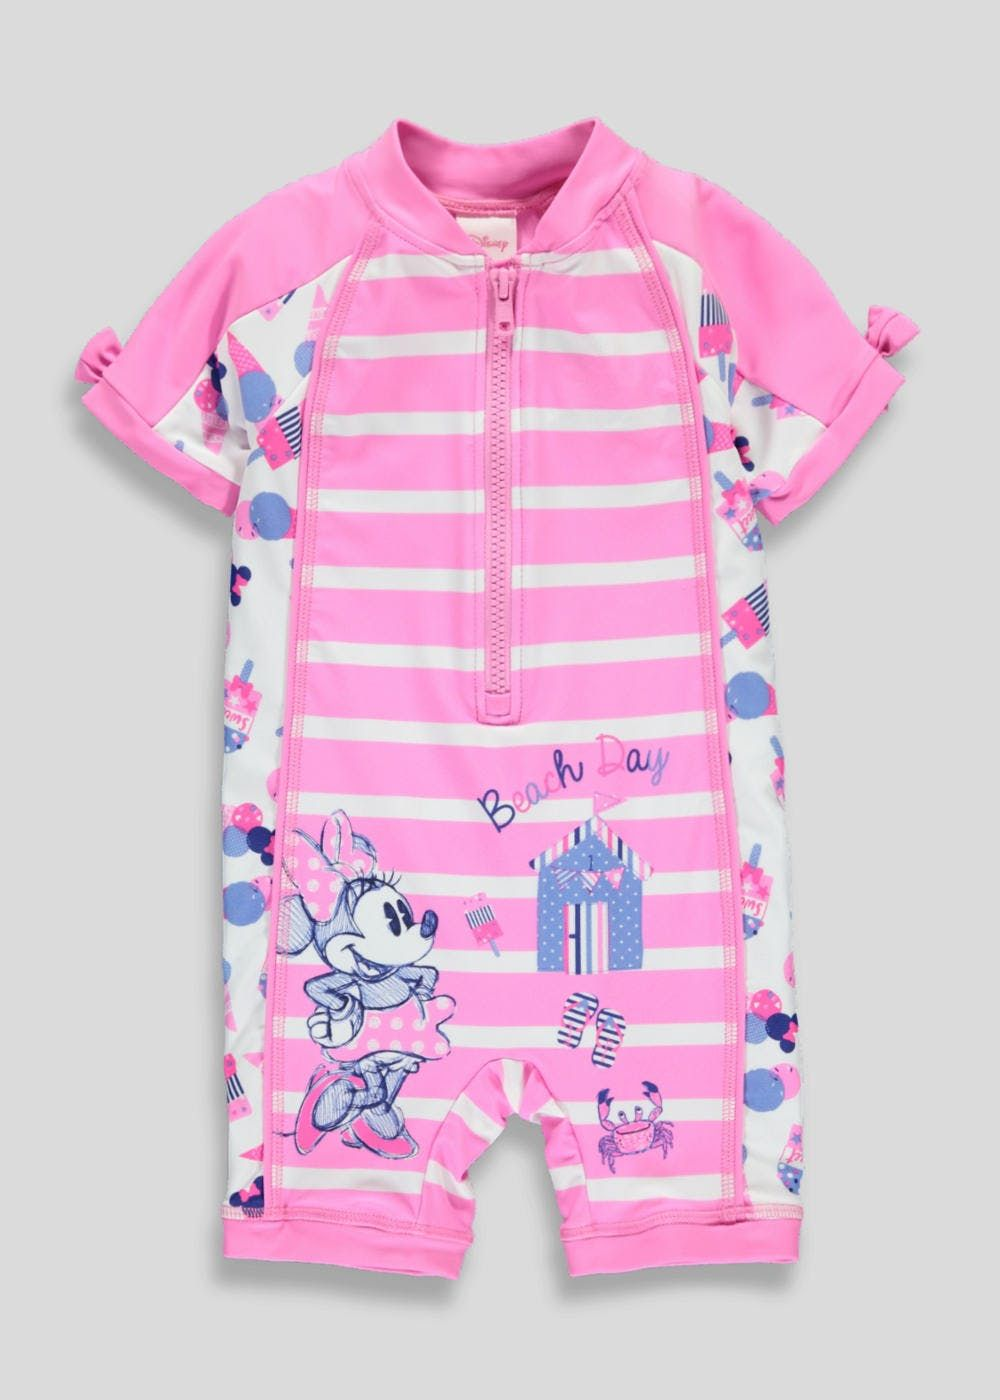 9727b63317628 Womens, Mens, Kids & Homeware Online | s w i m _ g i r l s | Clothes ...